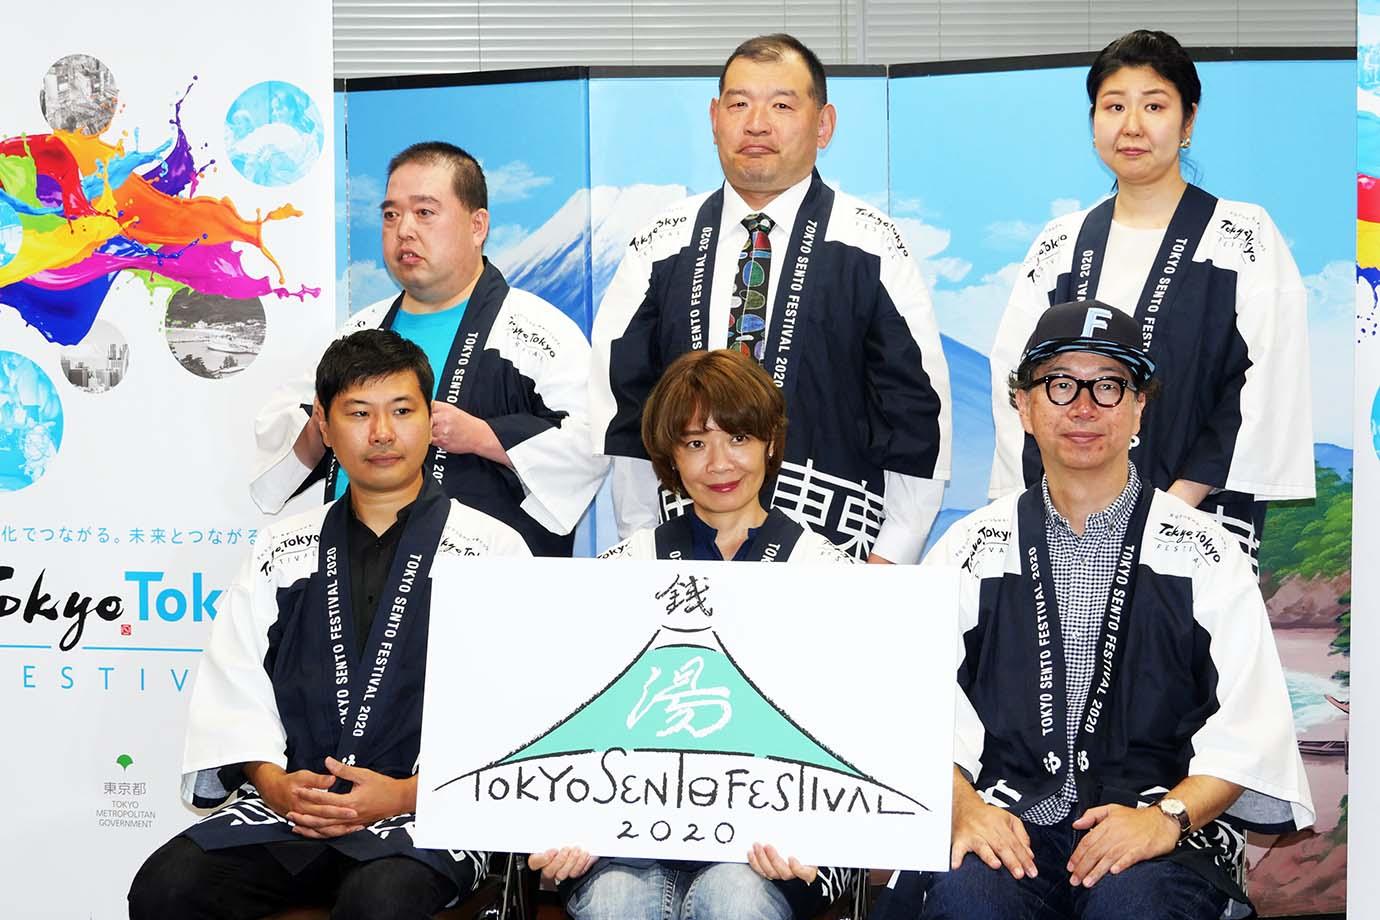 tokyo-sento-festival-2020-thermae-romae6